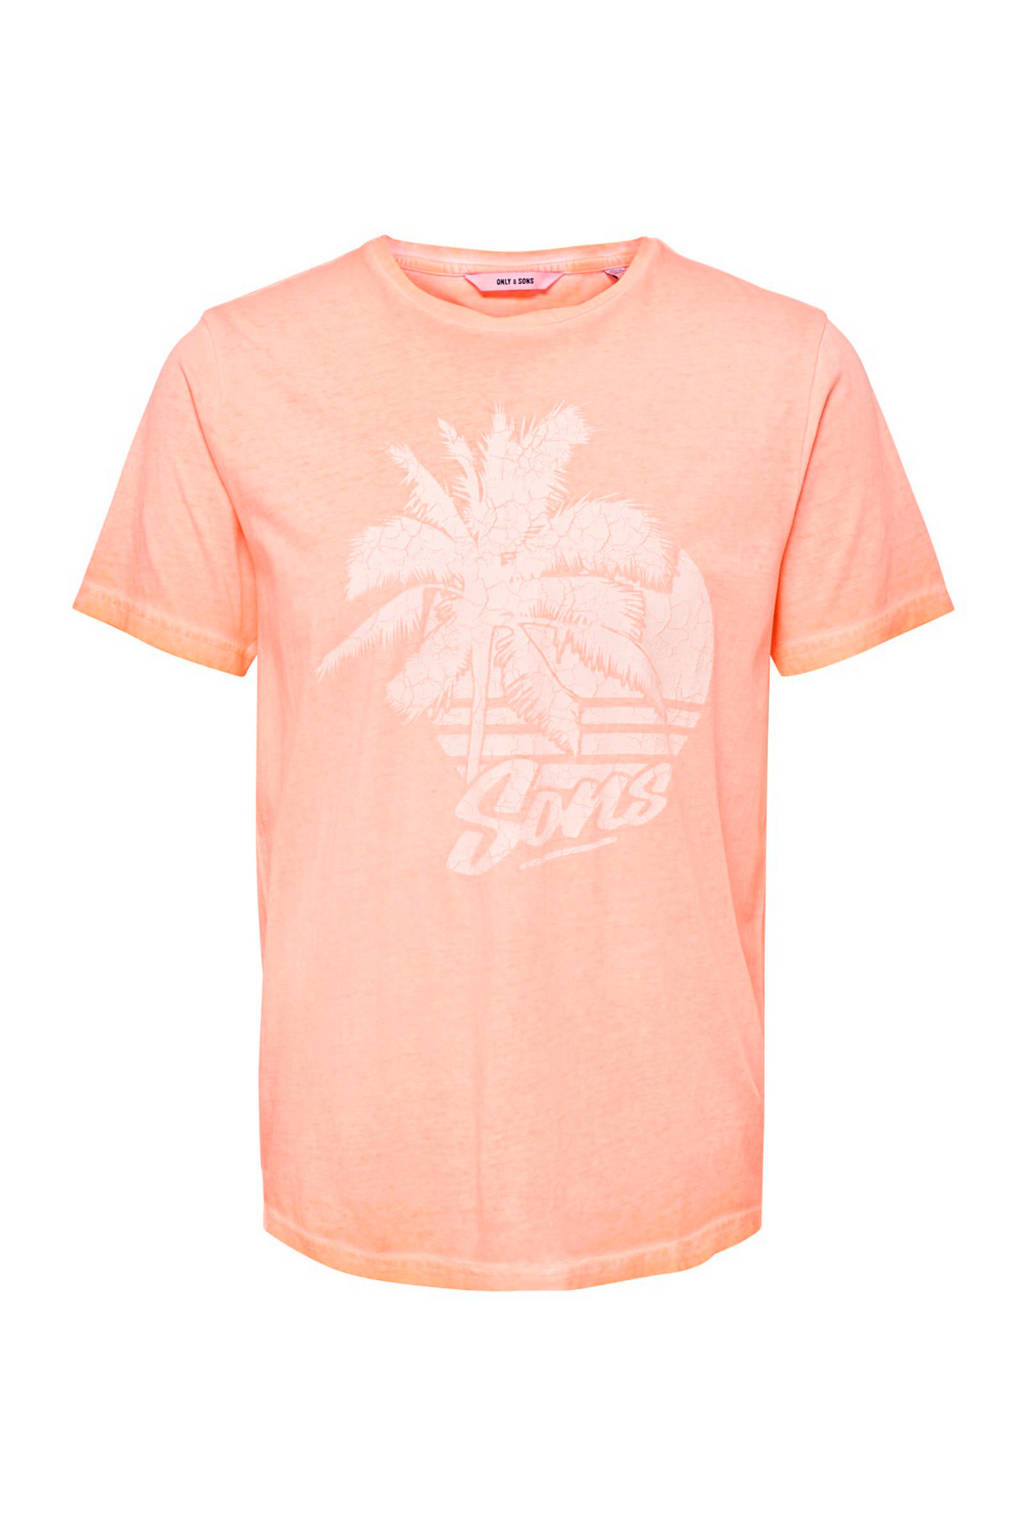 Only & Sons T-shirt met printopdruk, Zalm